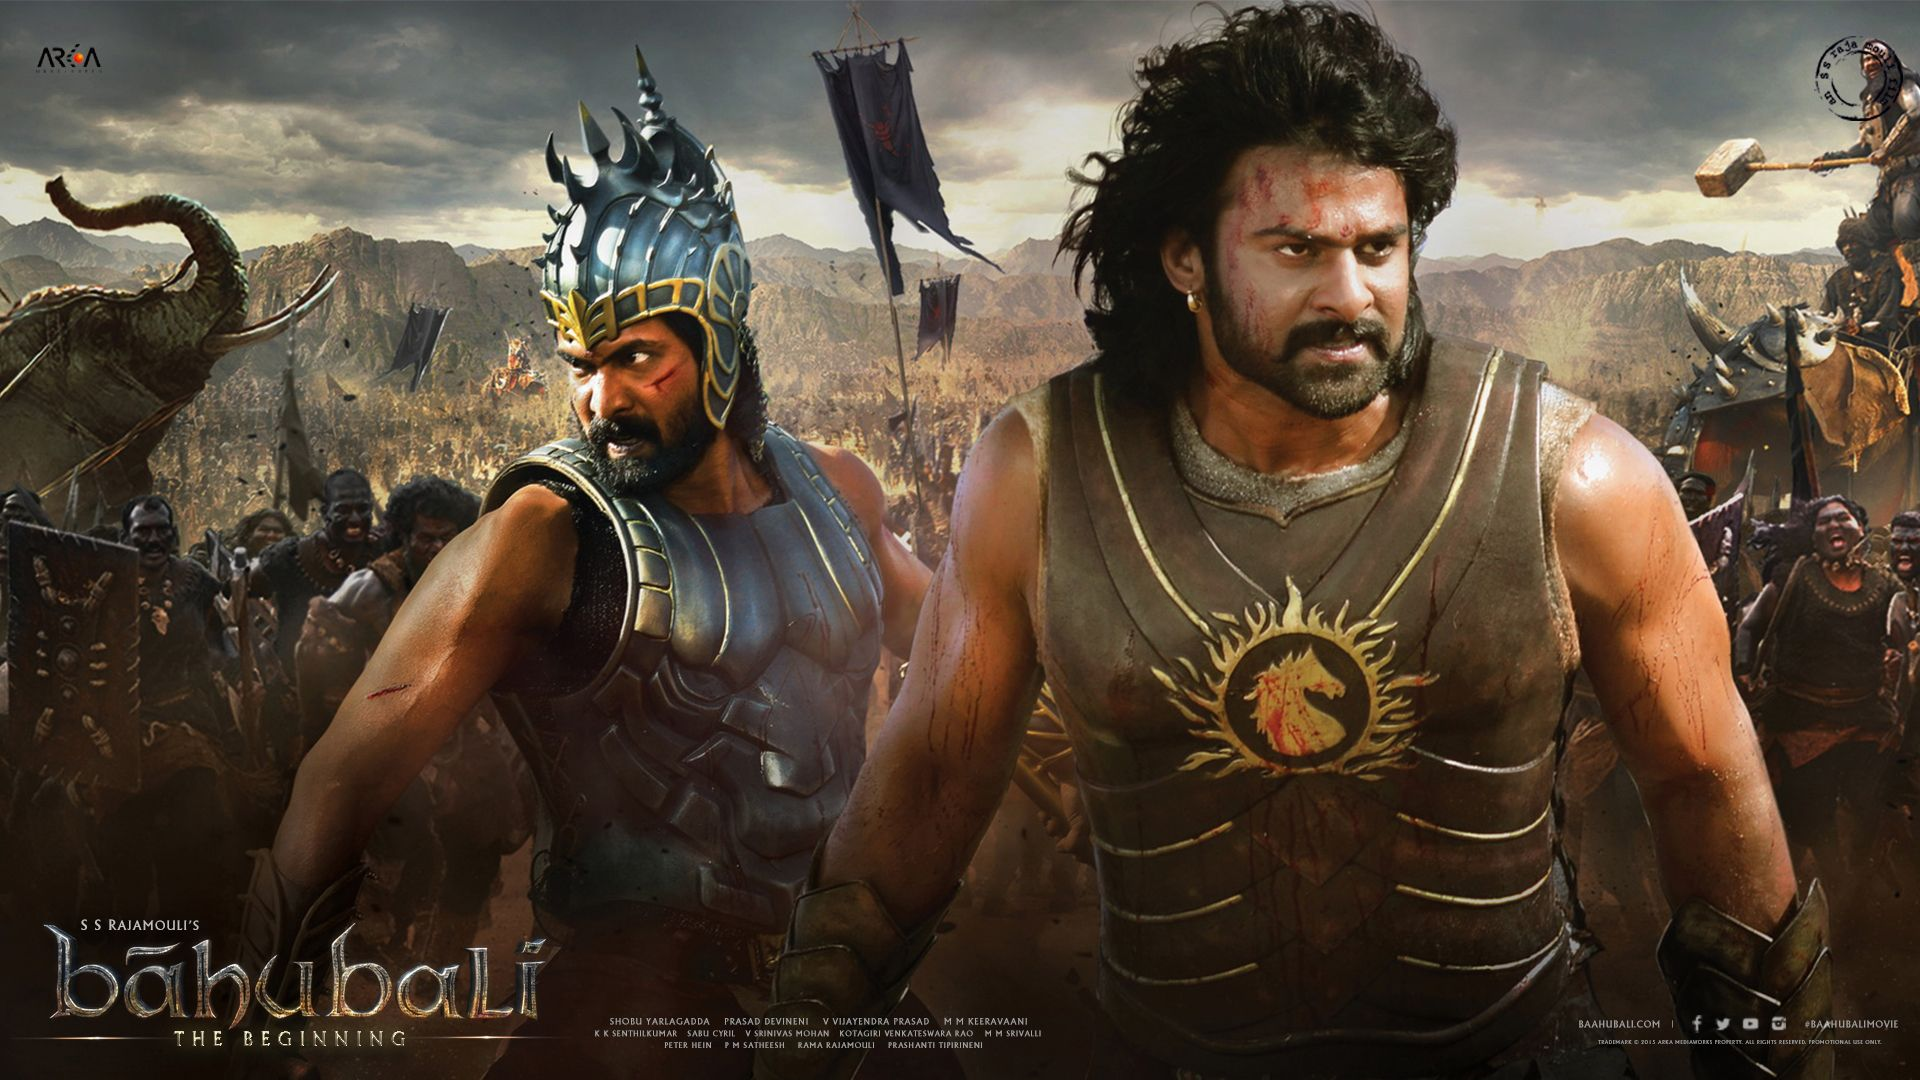 baahubali-the-beginning-Prabhas-top-movies